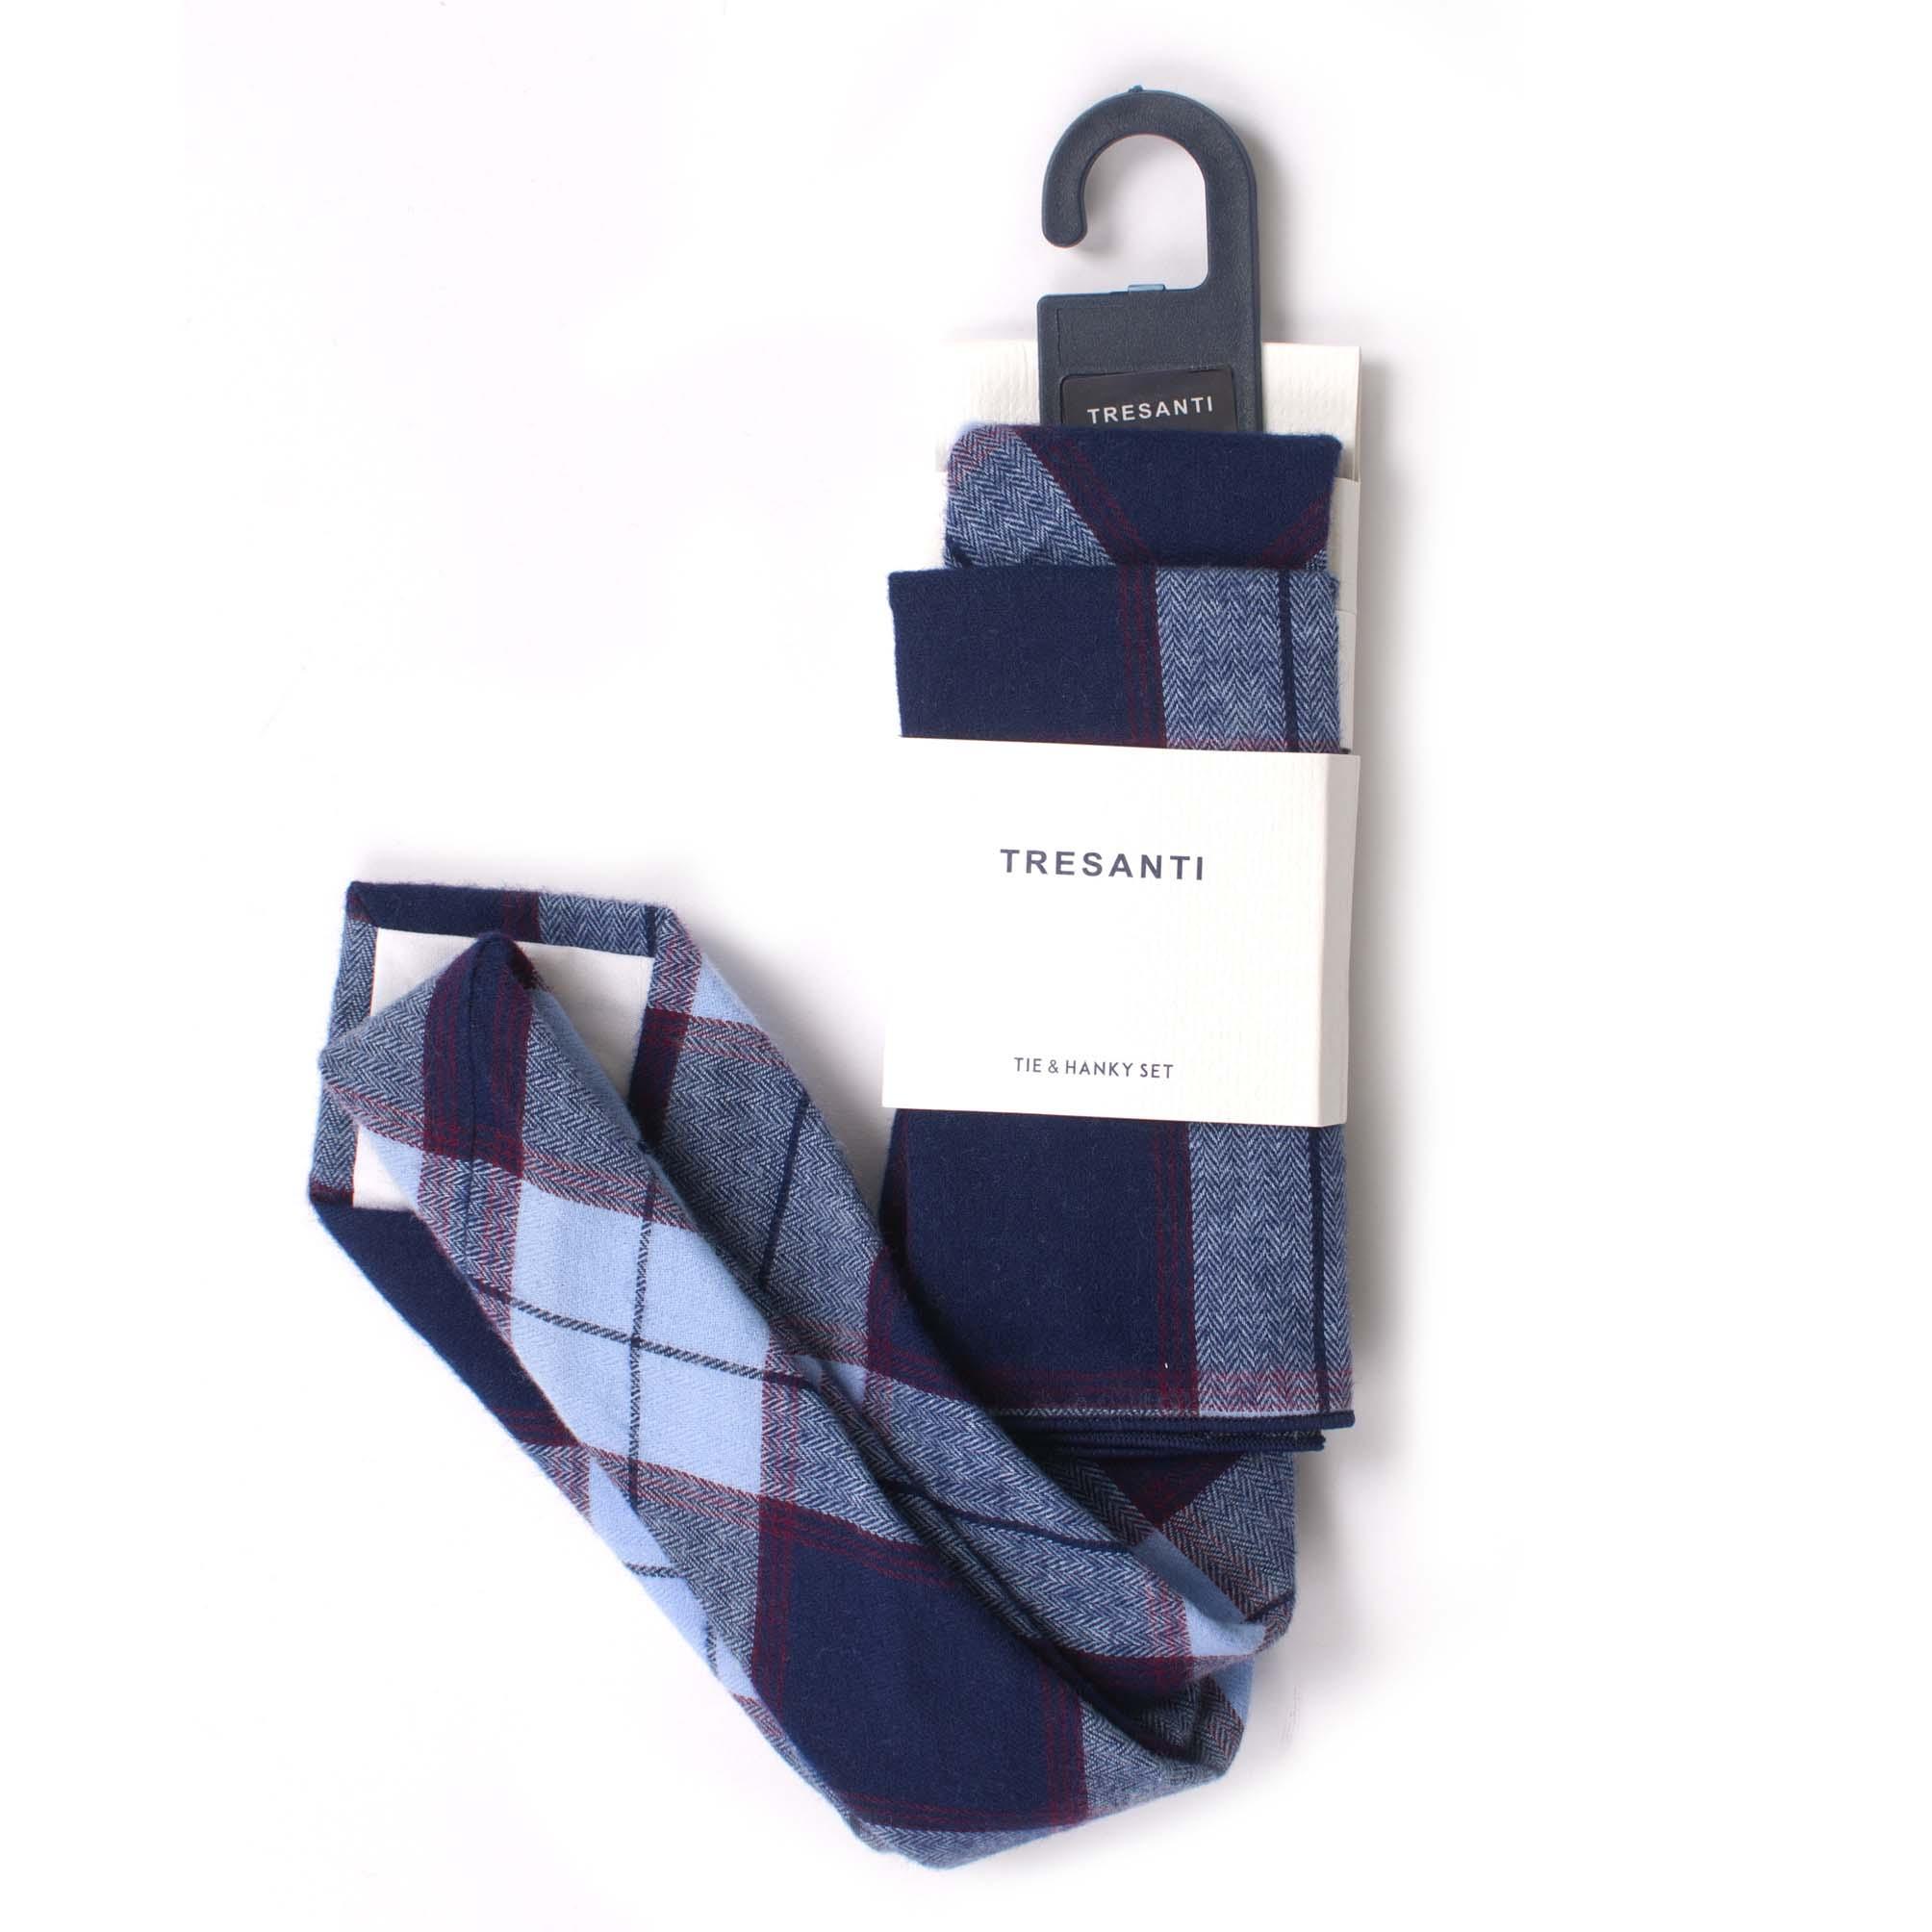 Tie & hanky set cotton check design